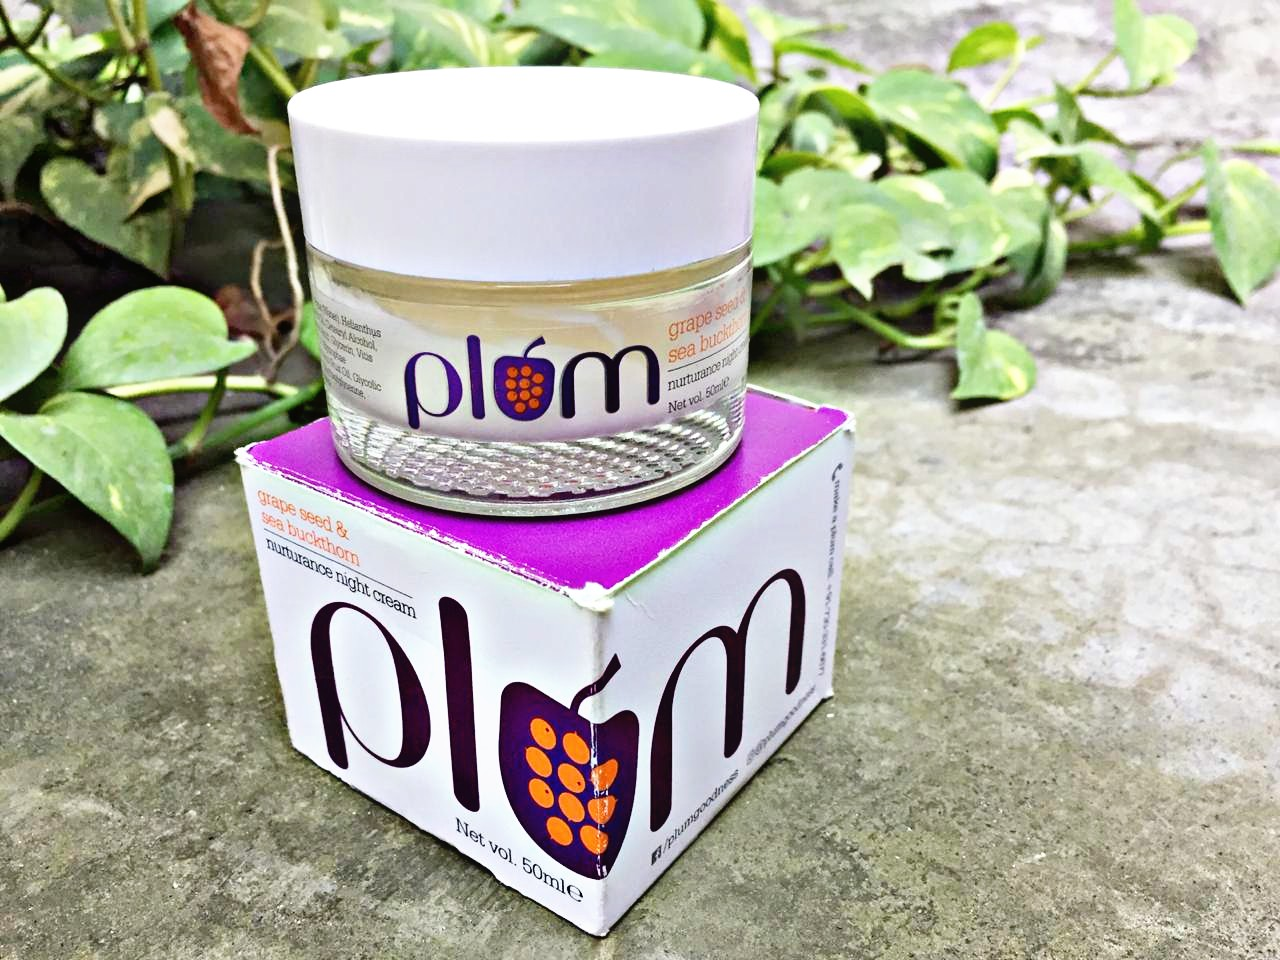 Plum Grape Seed & Sea Buckthorn Night Cream Review